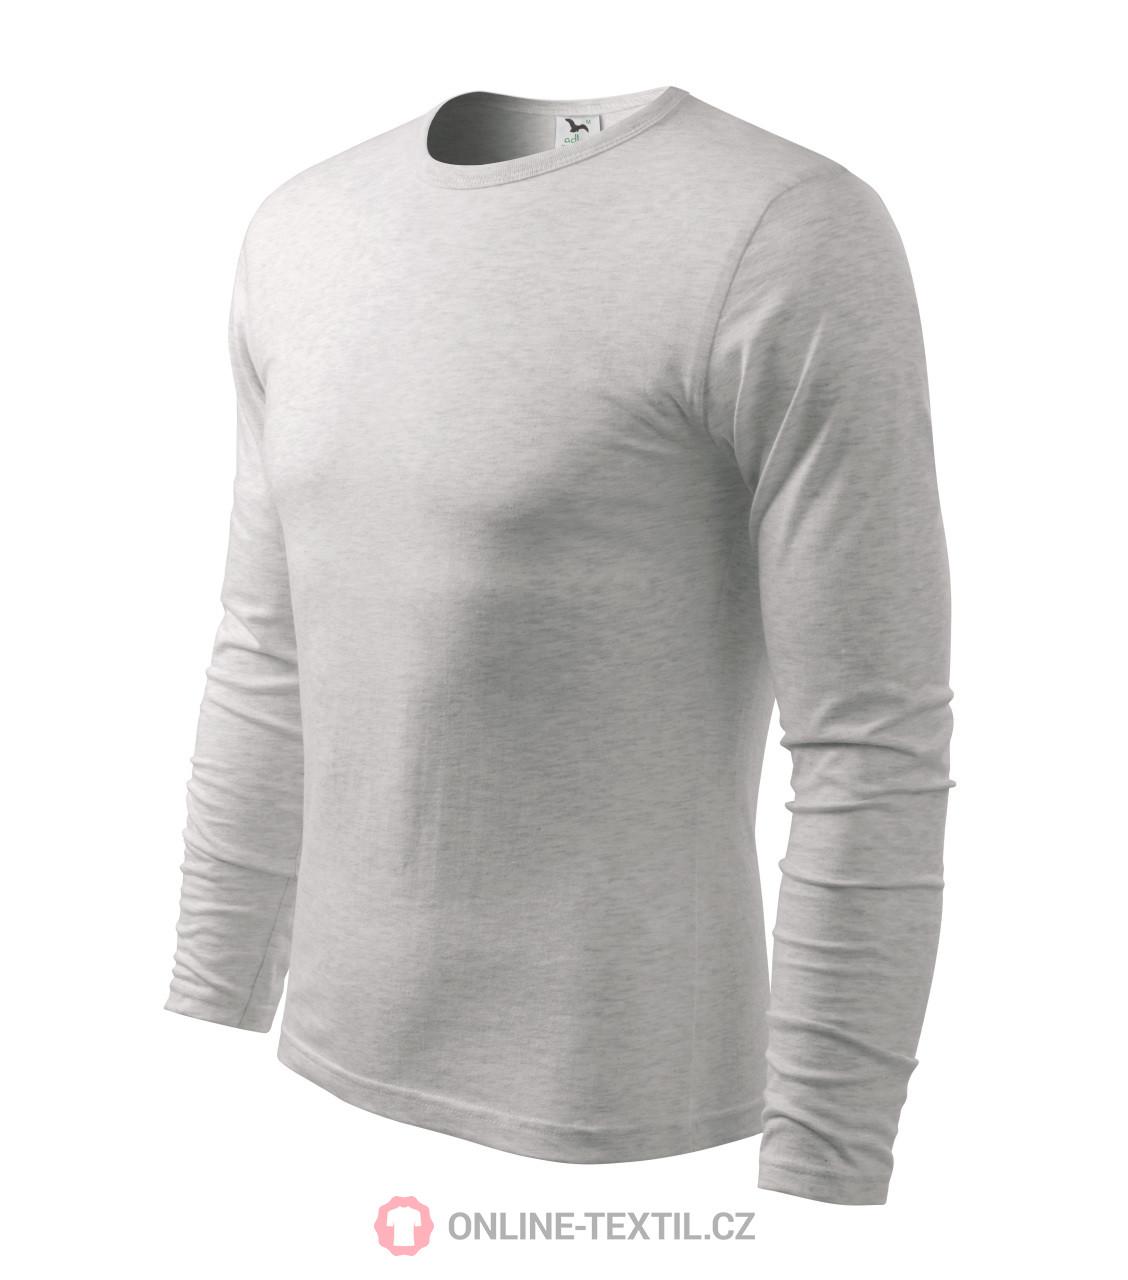 7a103a010 ADLER CZECH Tričko pánske FIT-T Long Sleeve X19 - svetlosivý melír z ...